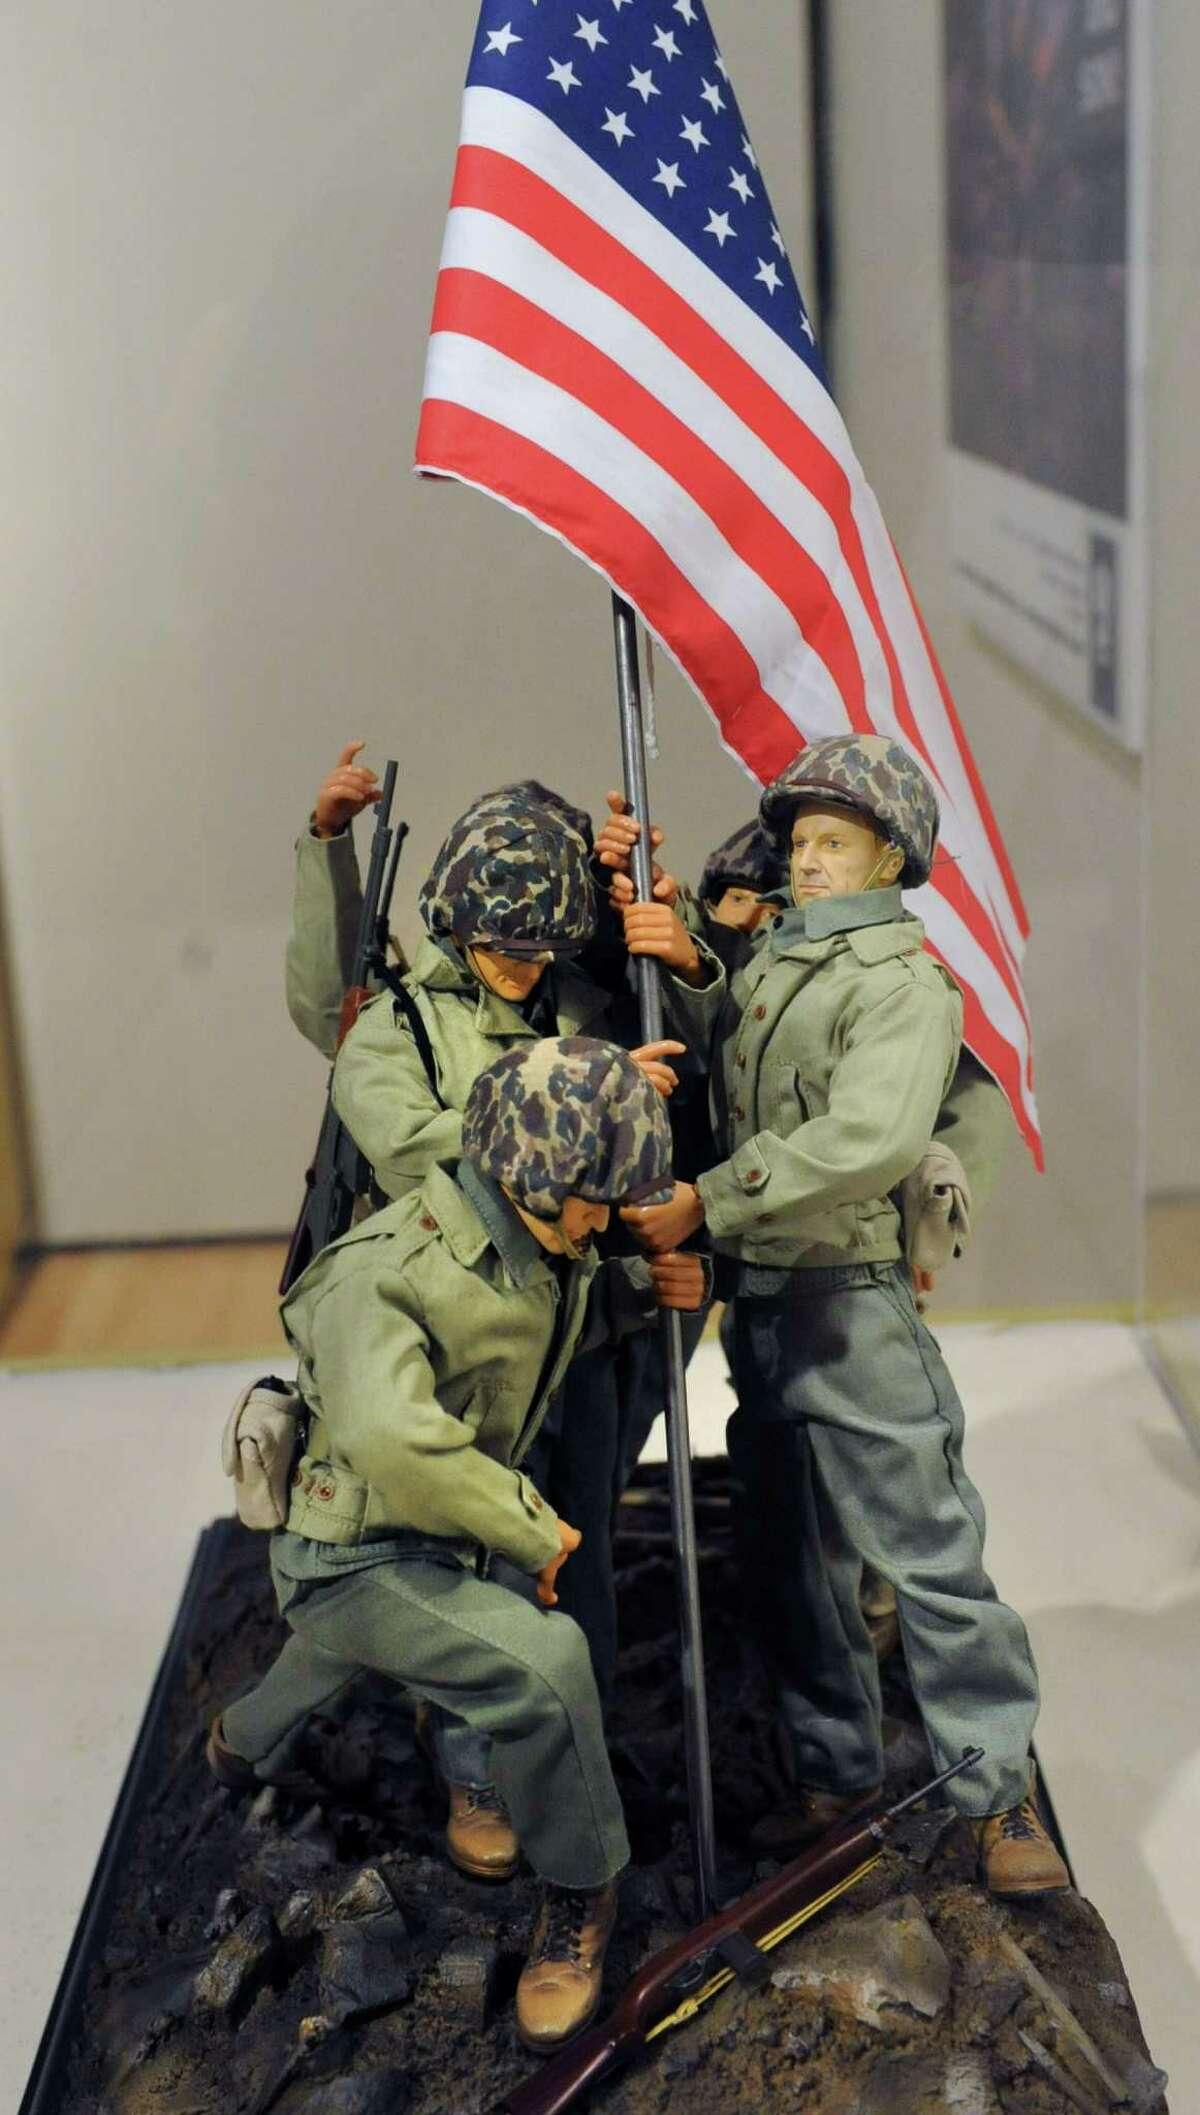 GI Joe dolls depicting Iwo Jima at a GI Joe